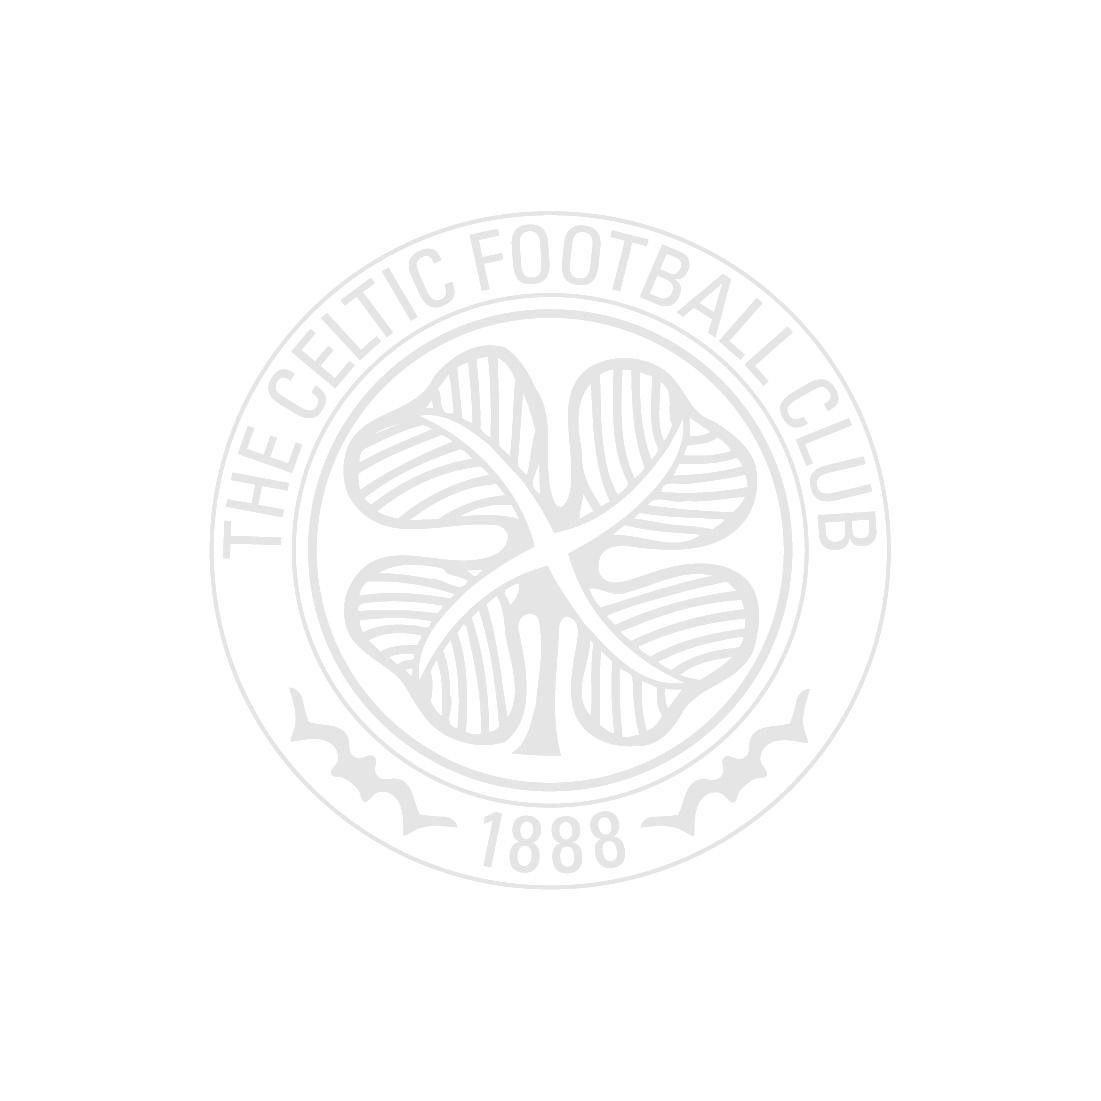 Celtic Cross Skills Football